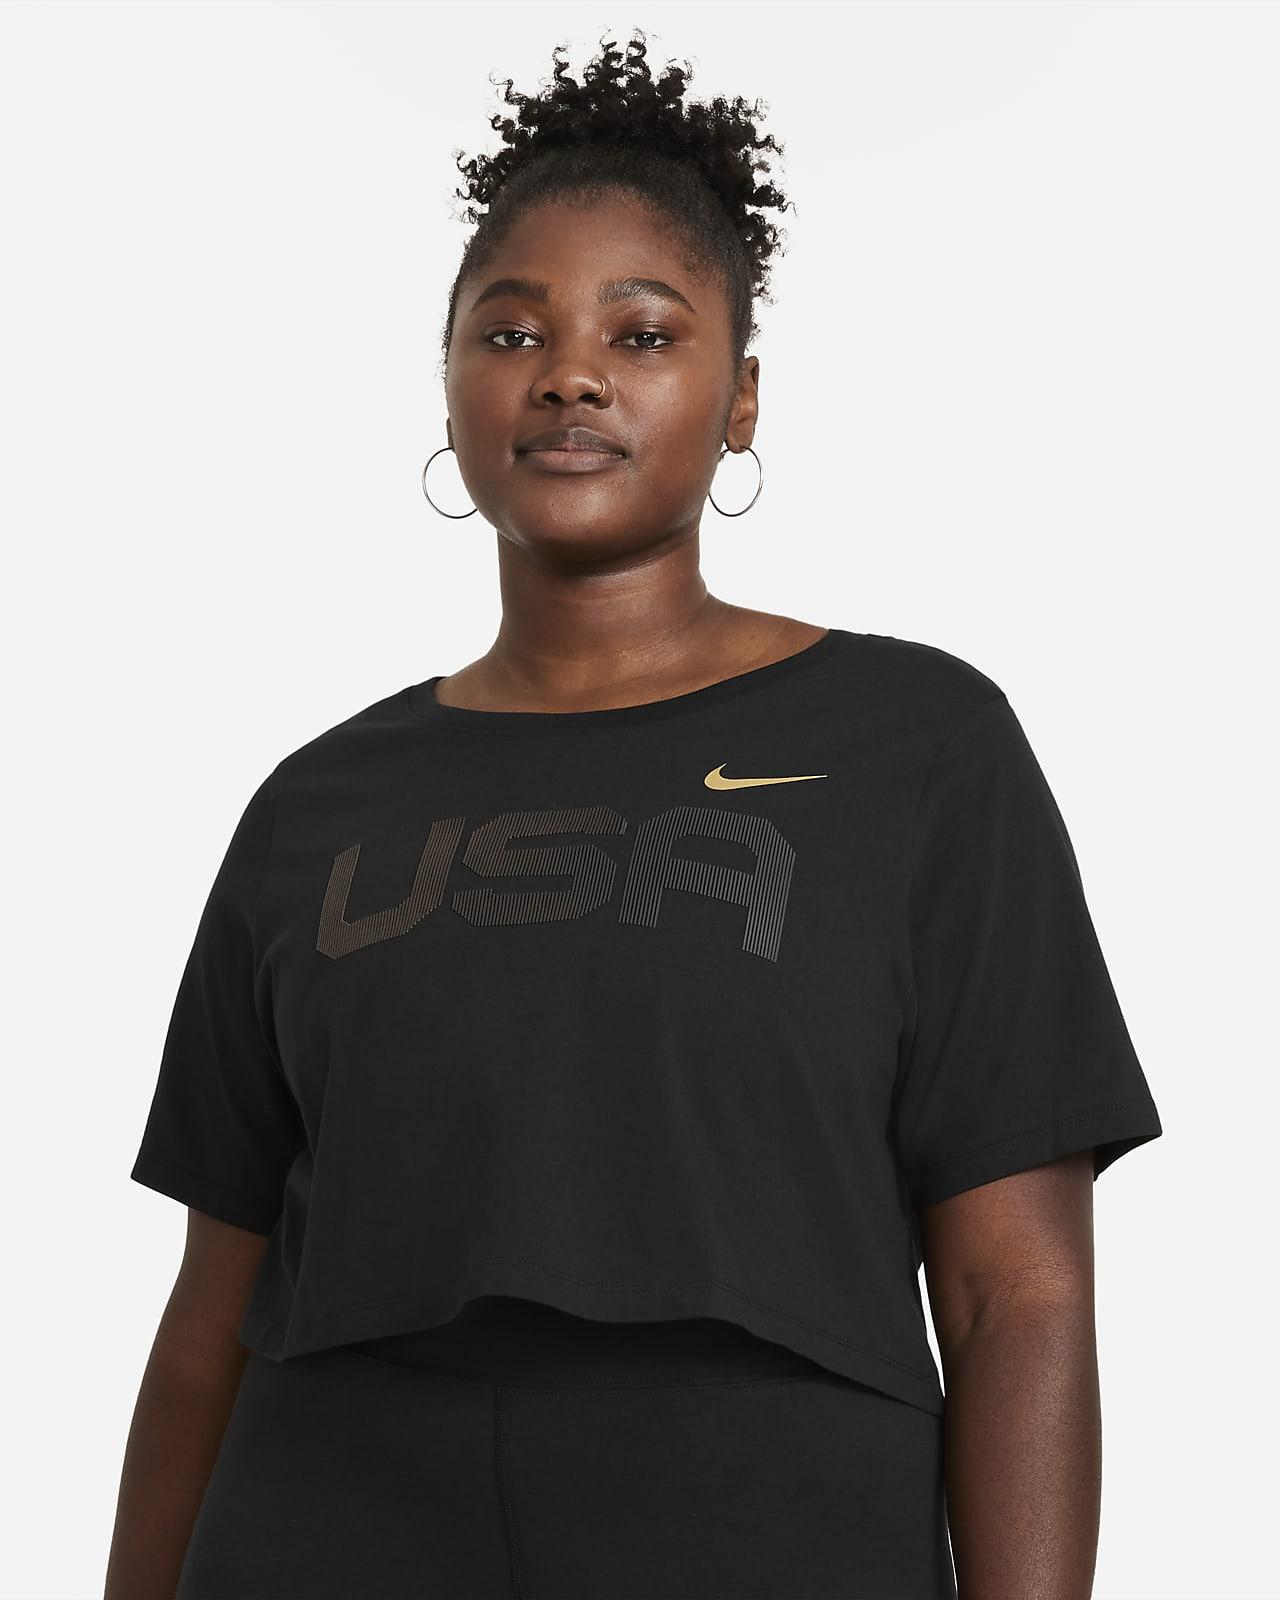 Playera corta para mujer (talla grande) Nike Sportswear USA